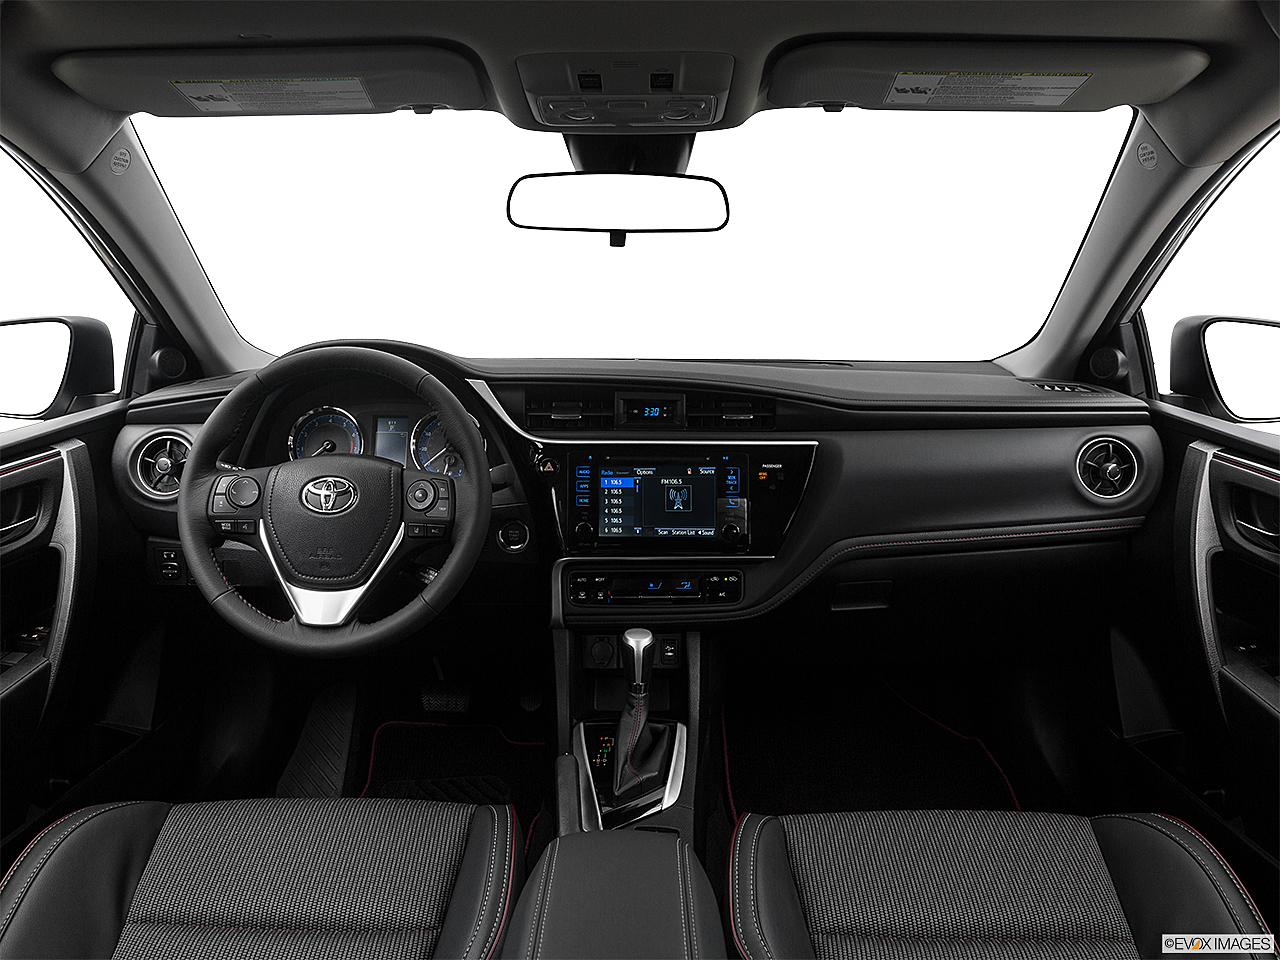 2017 Toyota Corolla 50th Anniversary Special Edition Centered Wide Dash Shot